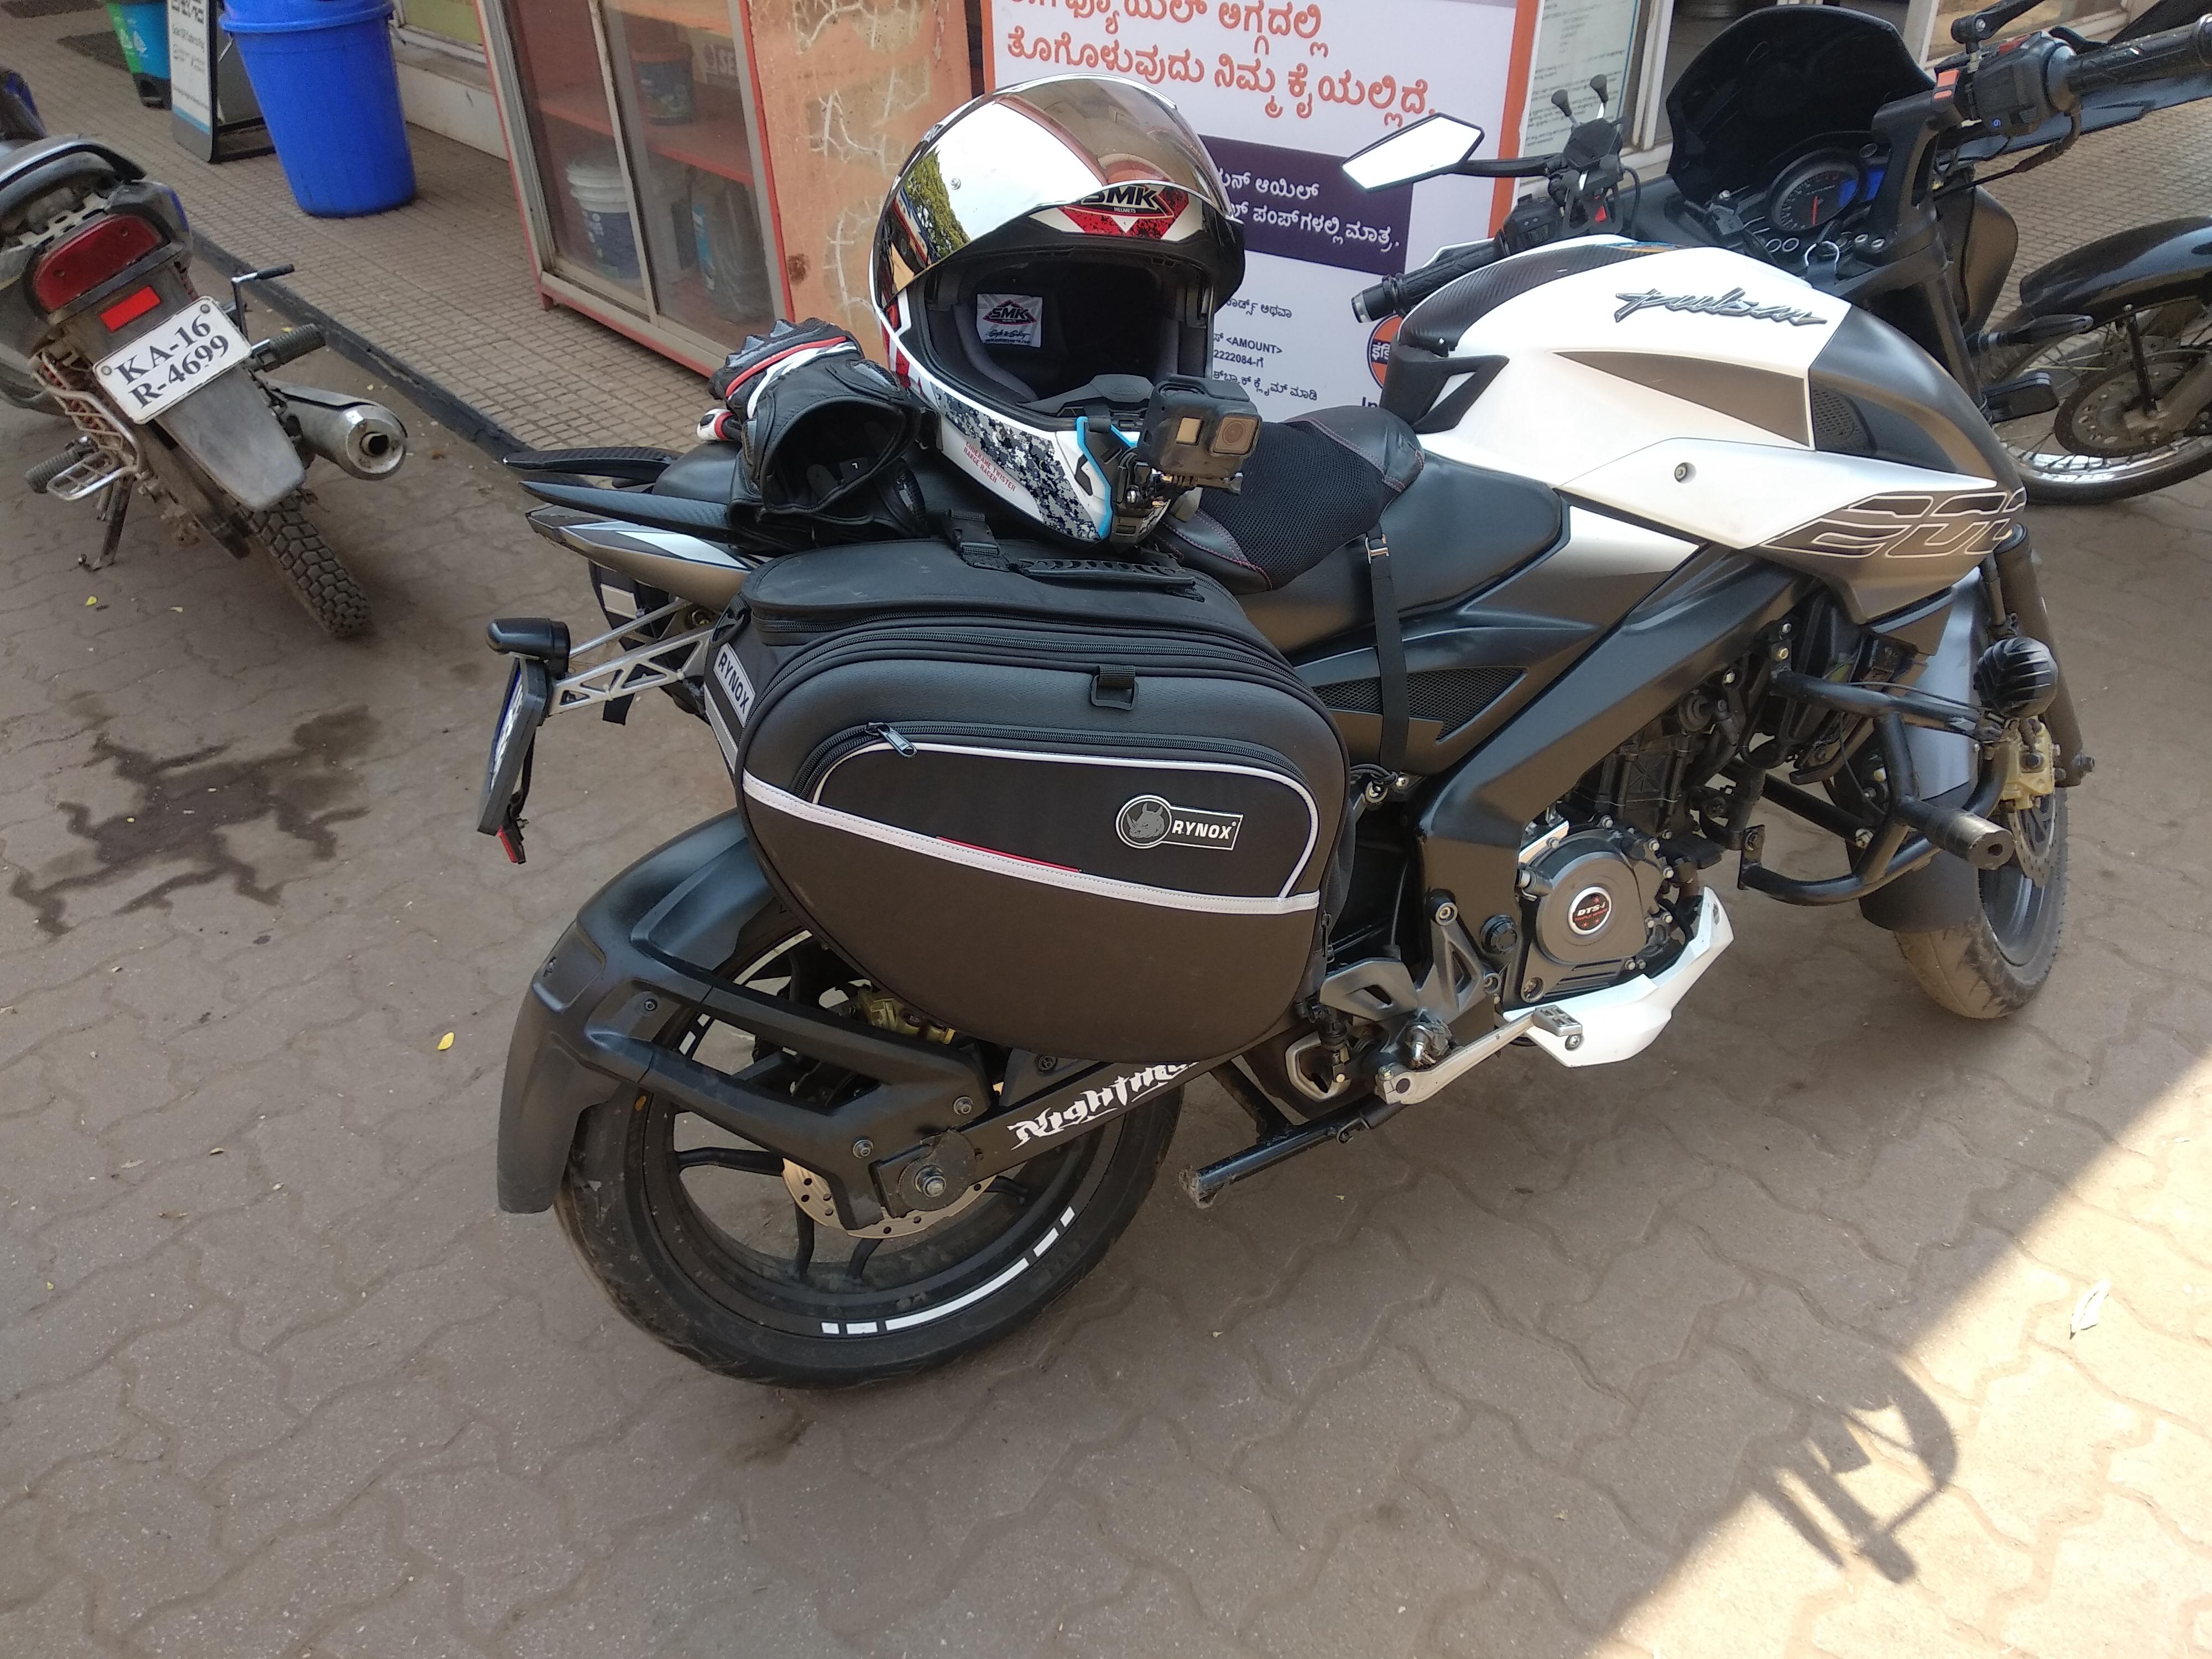 Ride Image by Suraj Kamath